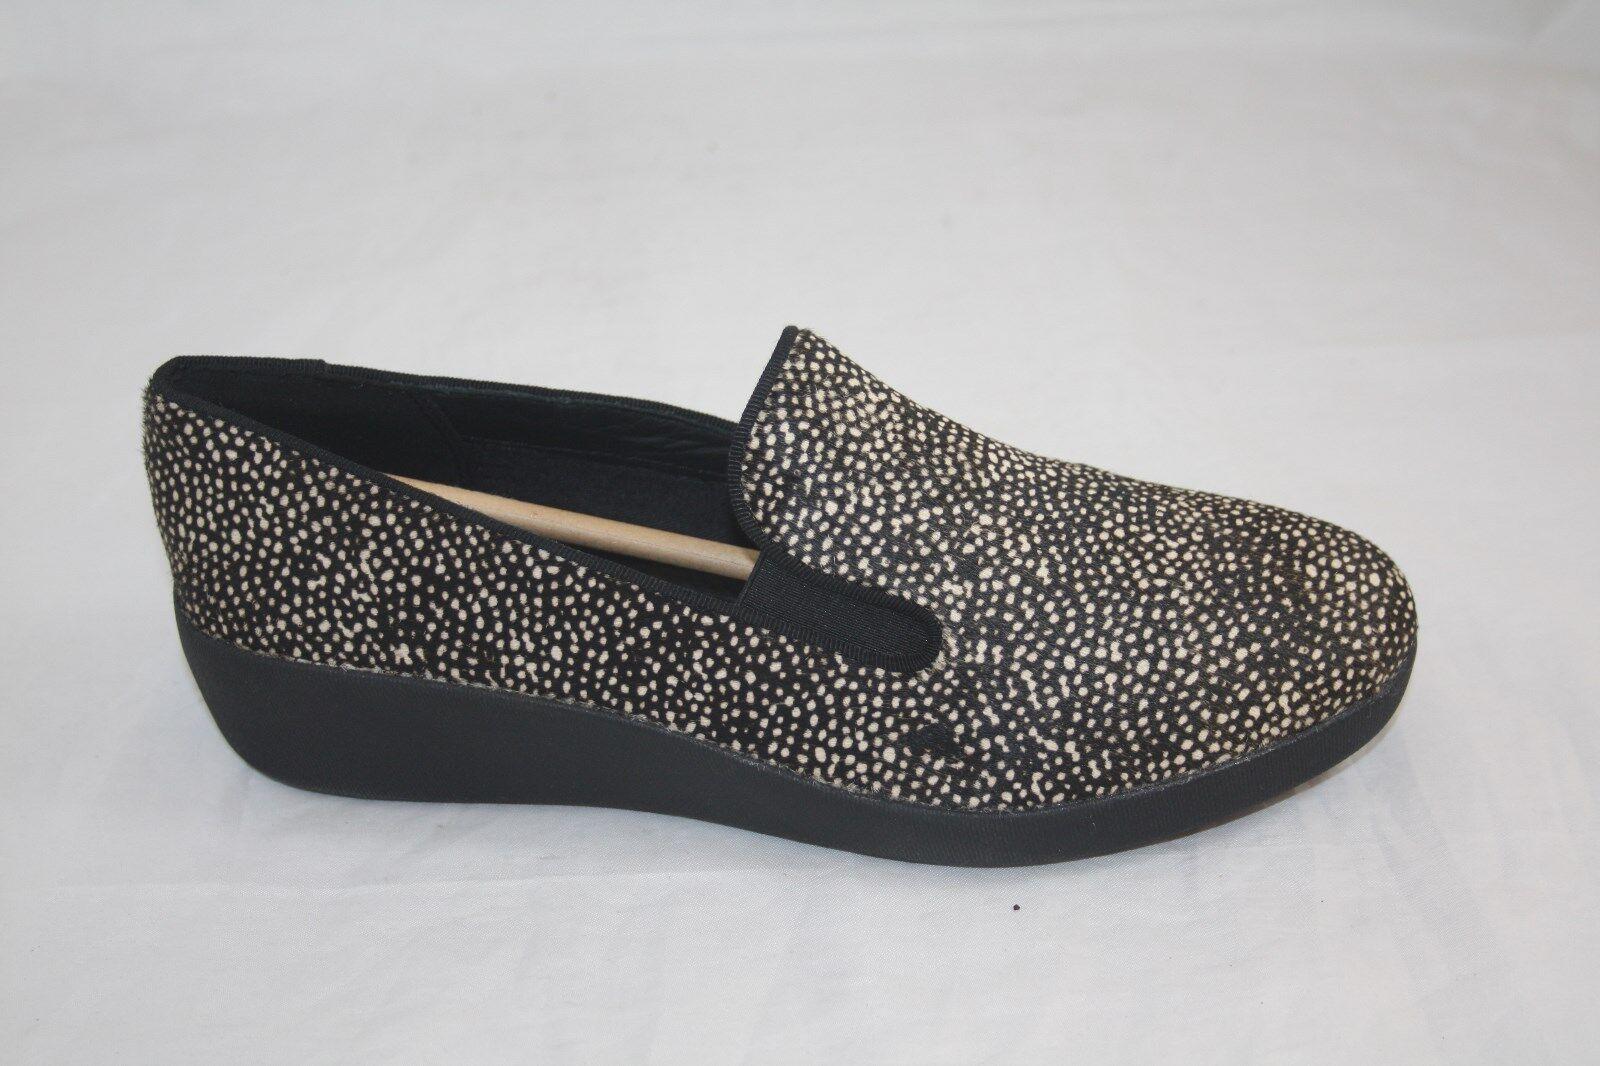 new wmns fitflop f-pop skate black mix flat real shoe real flat calf fur  msrp $140.00 9872ba